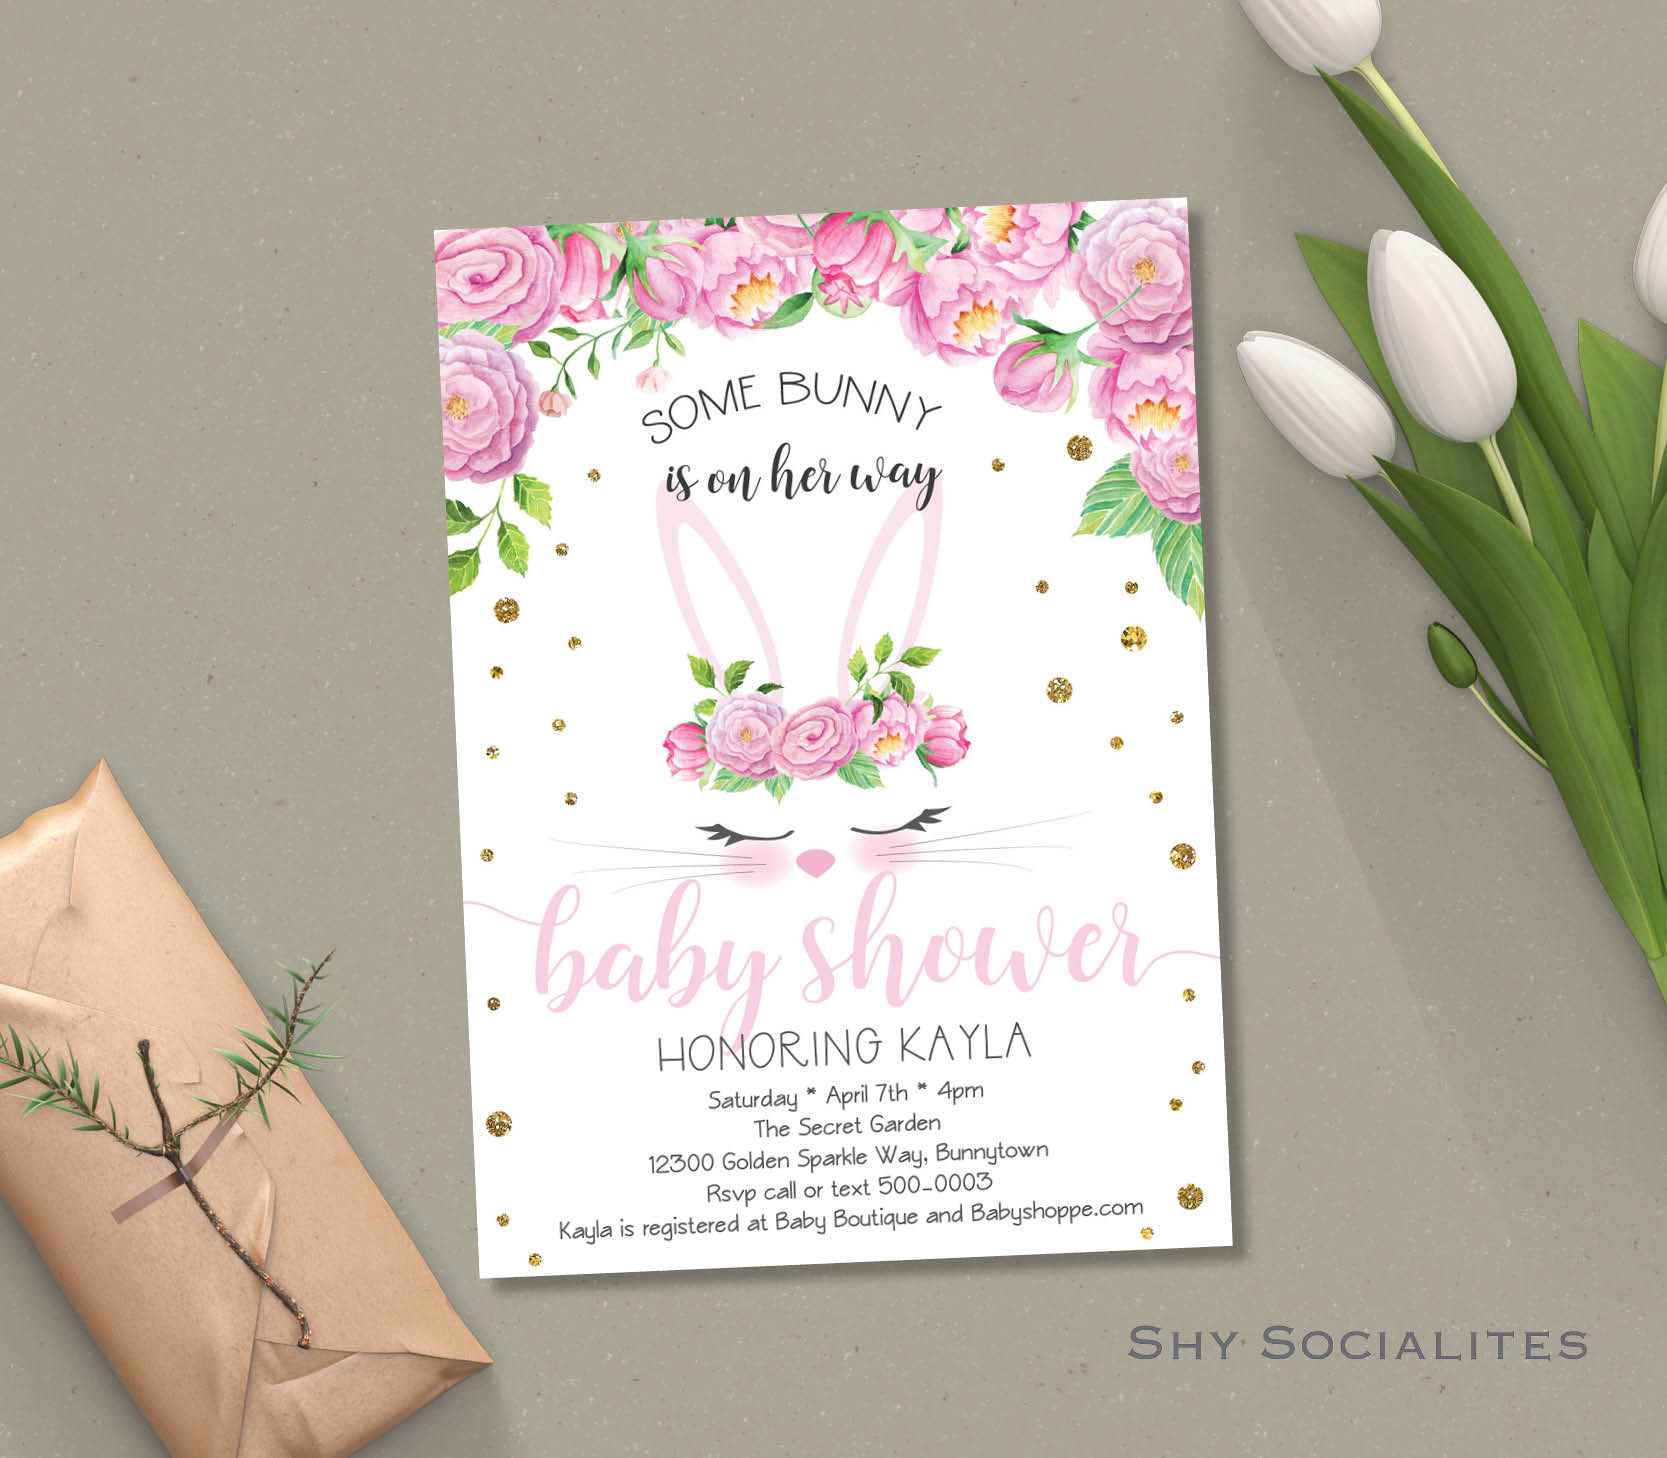 Bunny Face Easter Baby Shower Invitation Shy Socialites